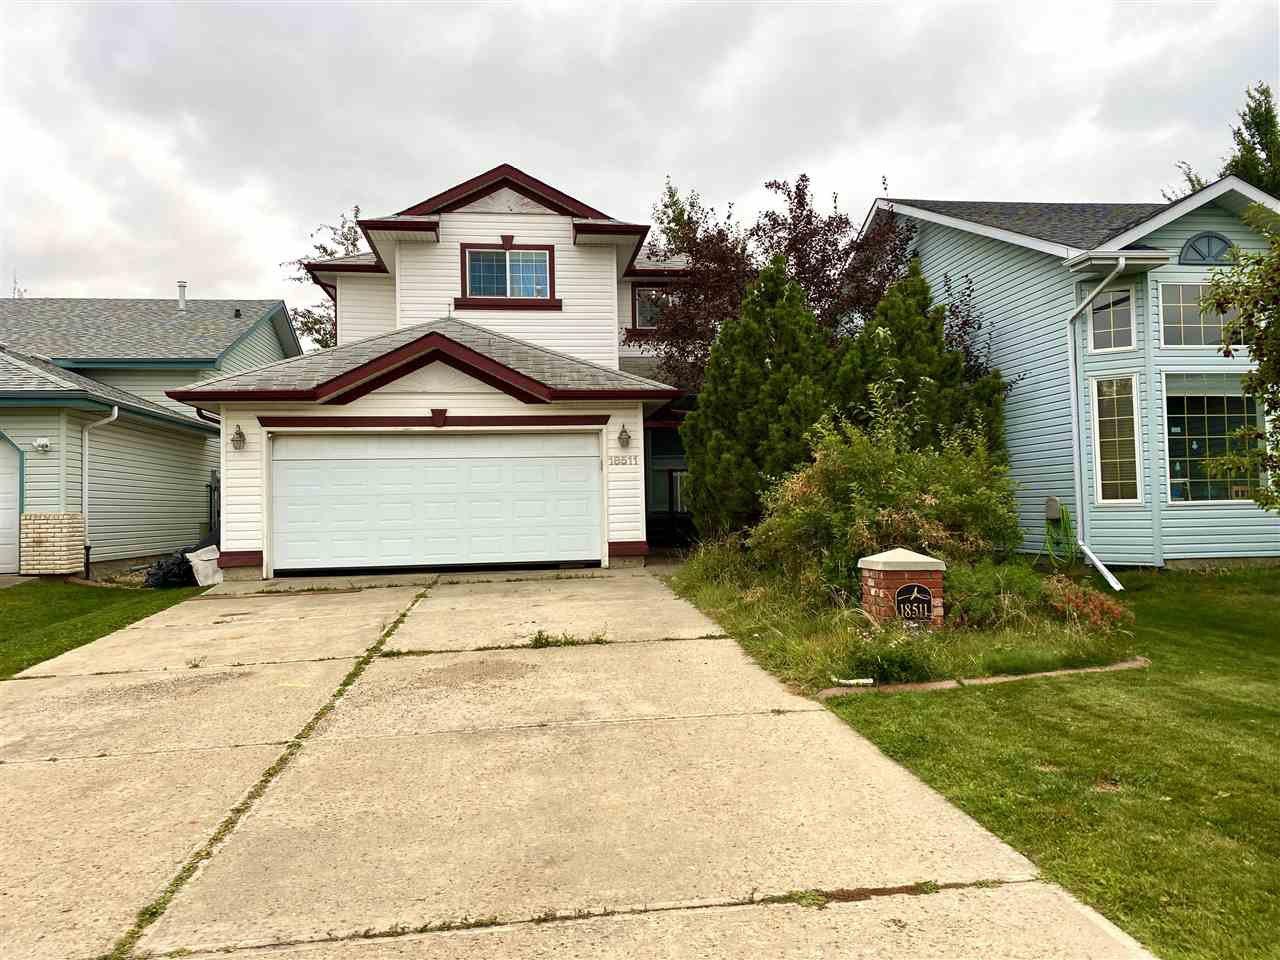 Main Photo: 18511 50 Avenue in Edmonton: Zone 20 House for sale : MLS®# E4214404